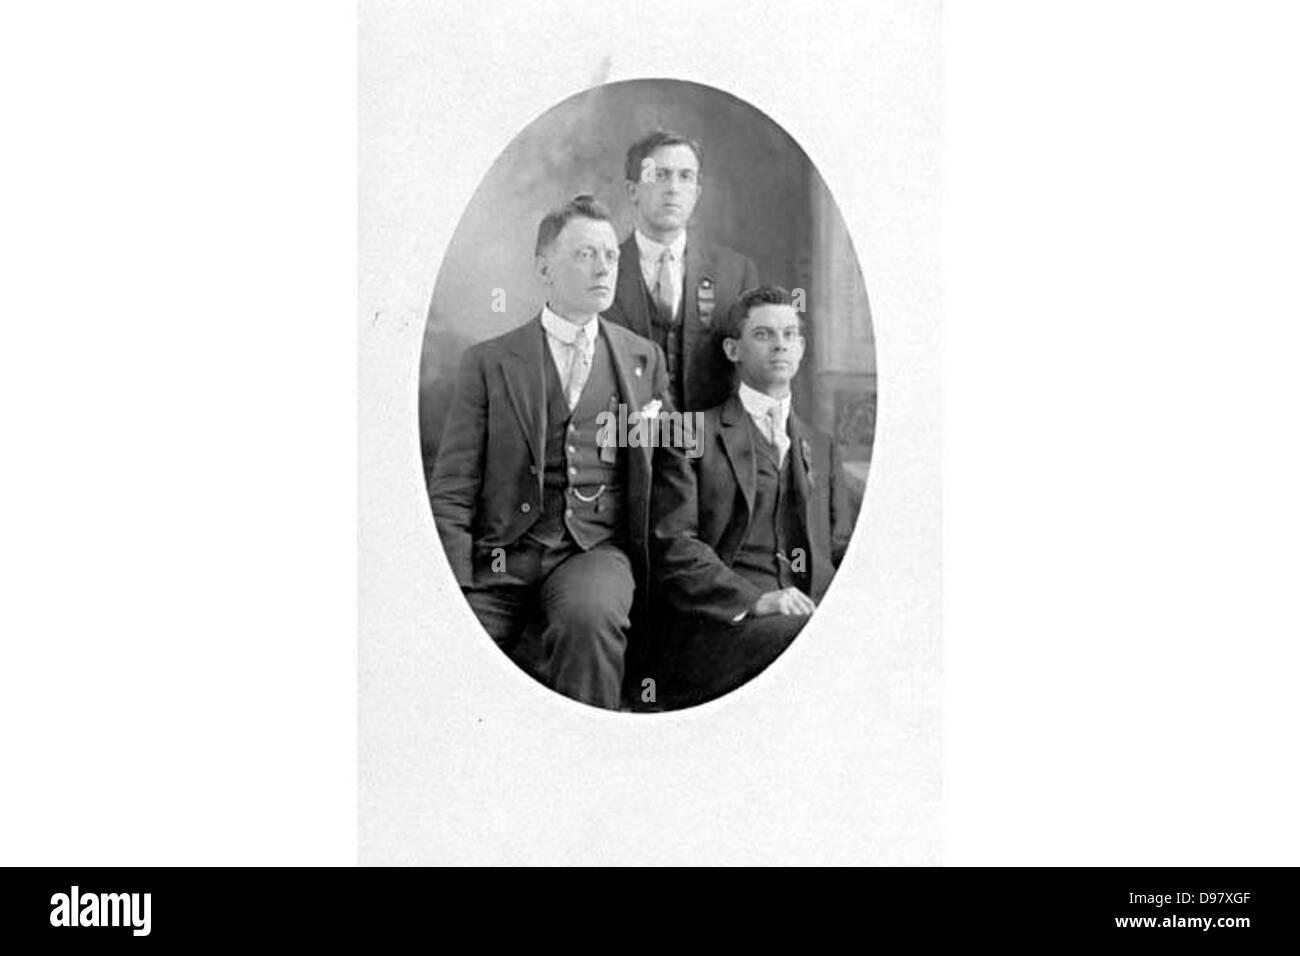 Photographic postcard of three IWW members c. 1920s-1930s. - Stock Image